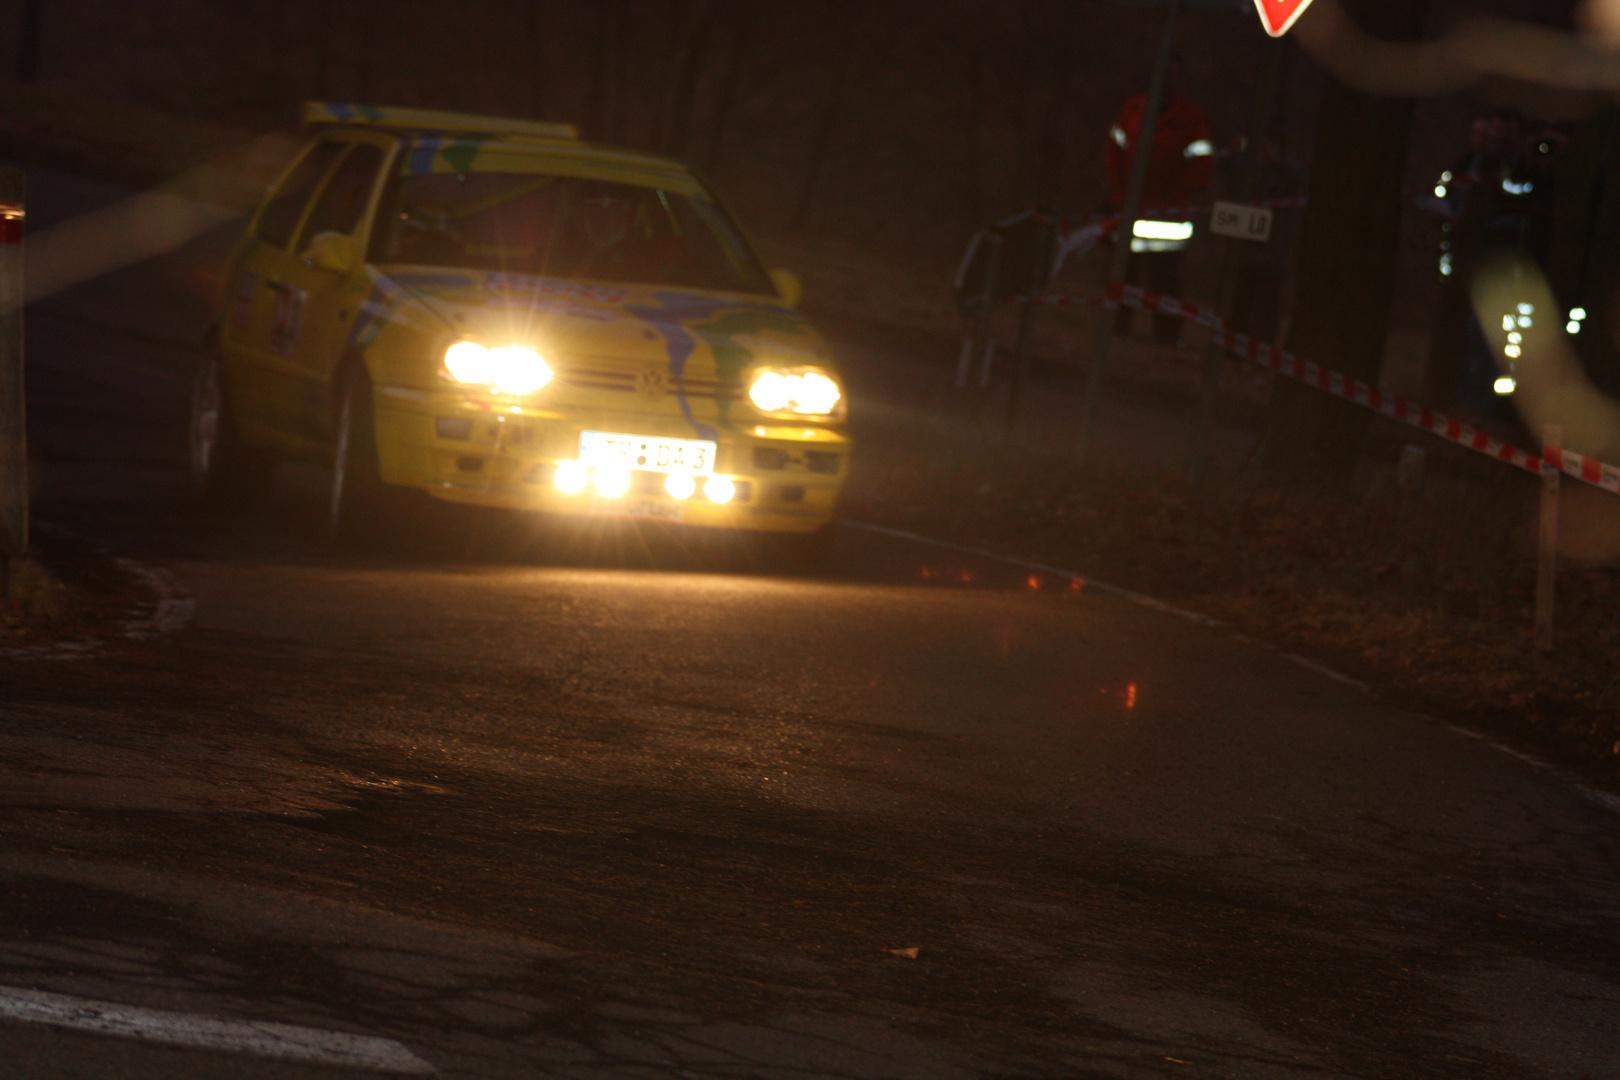 Nacht bei der Rallye ...